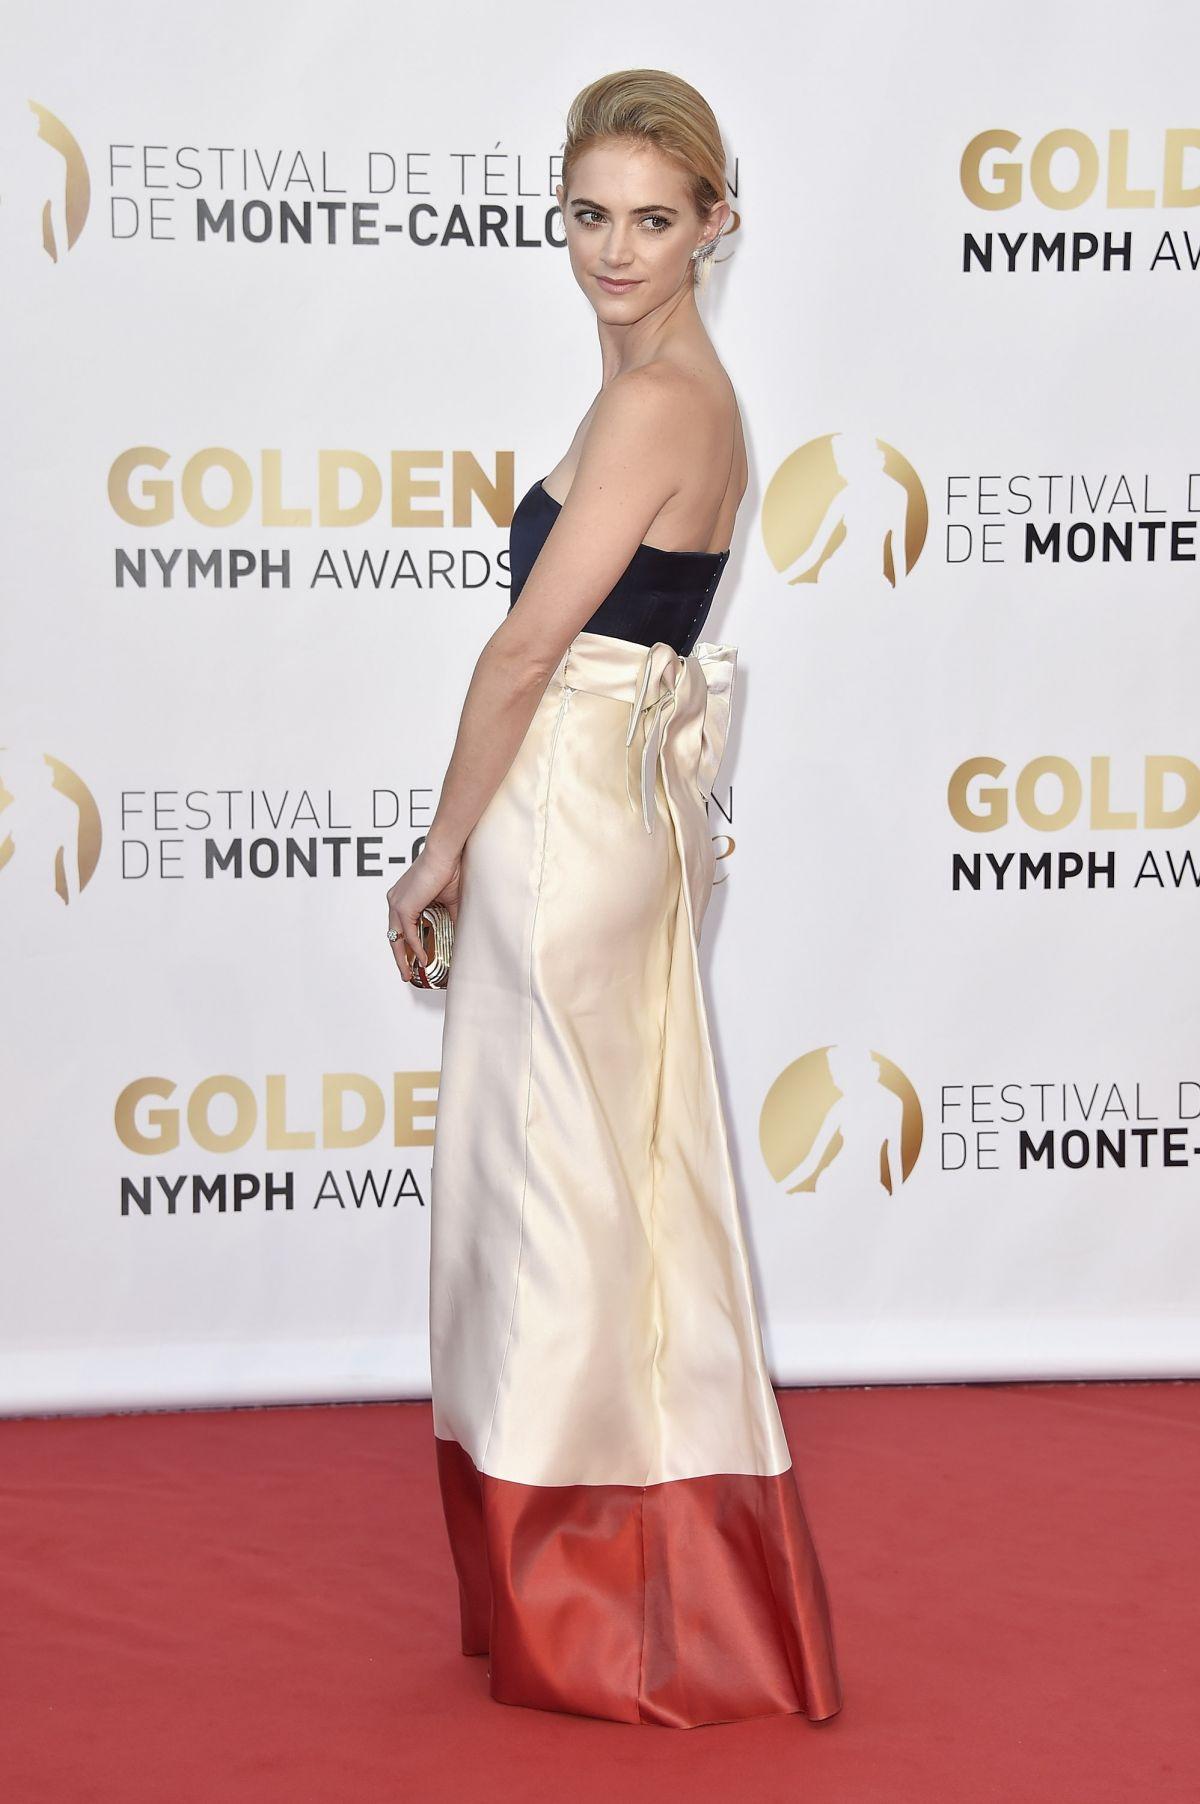 EMILY WICKERSHAM at 2014 Monte Carlo TV Festival Closing Ceremony